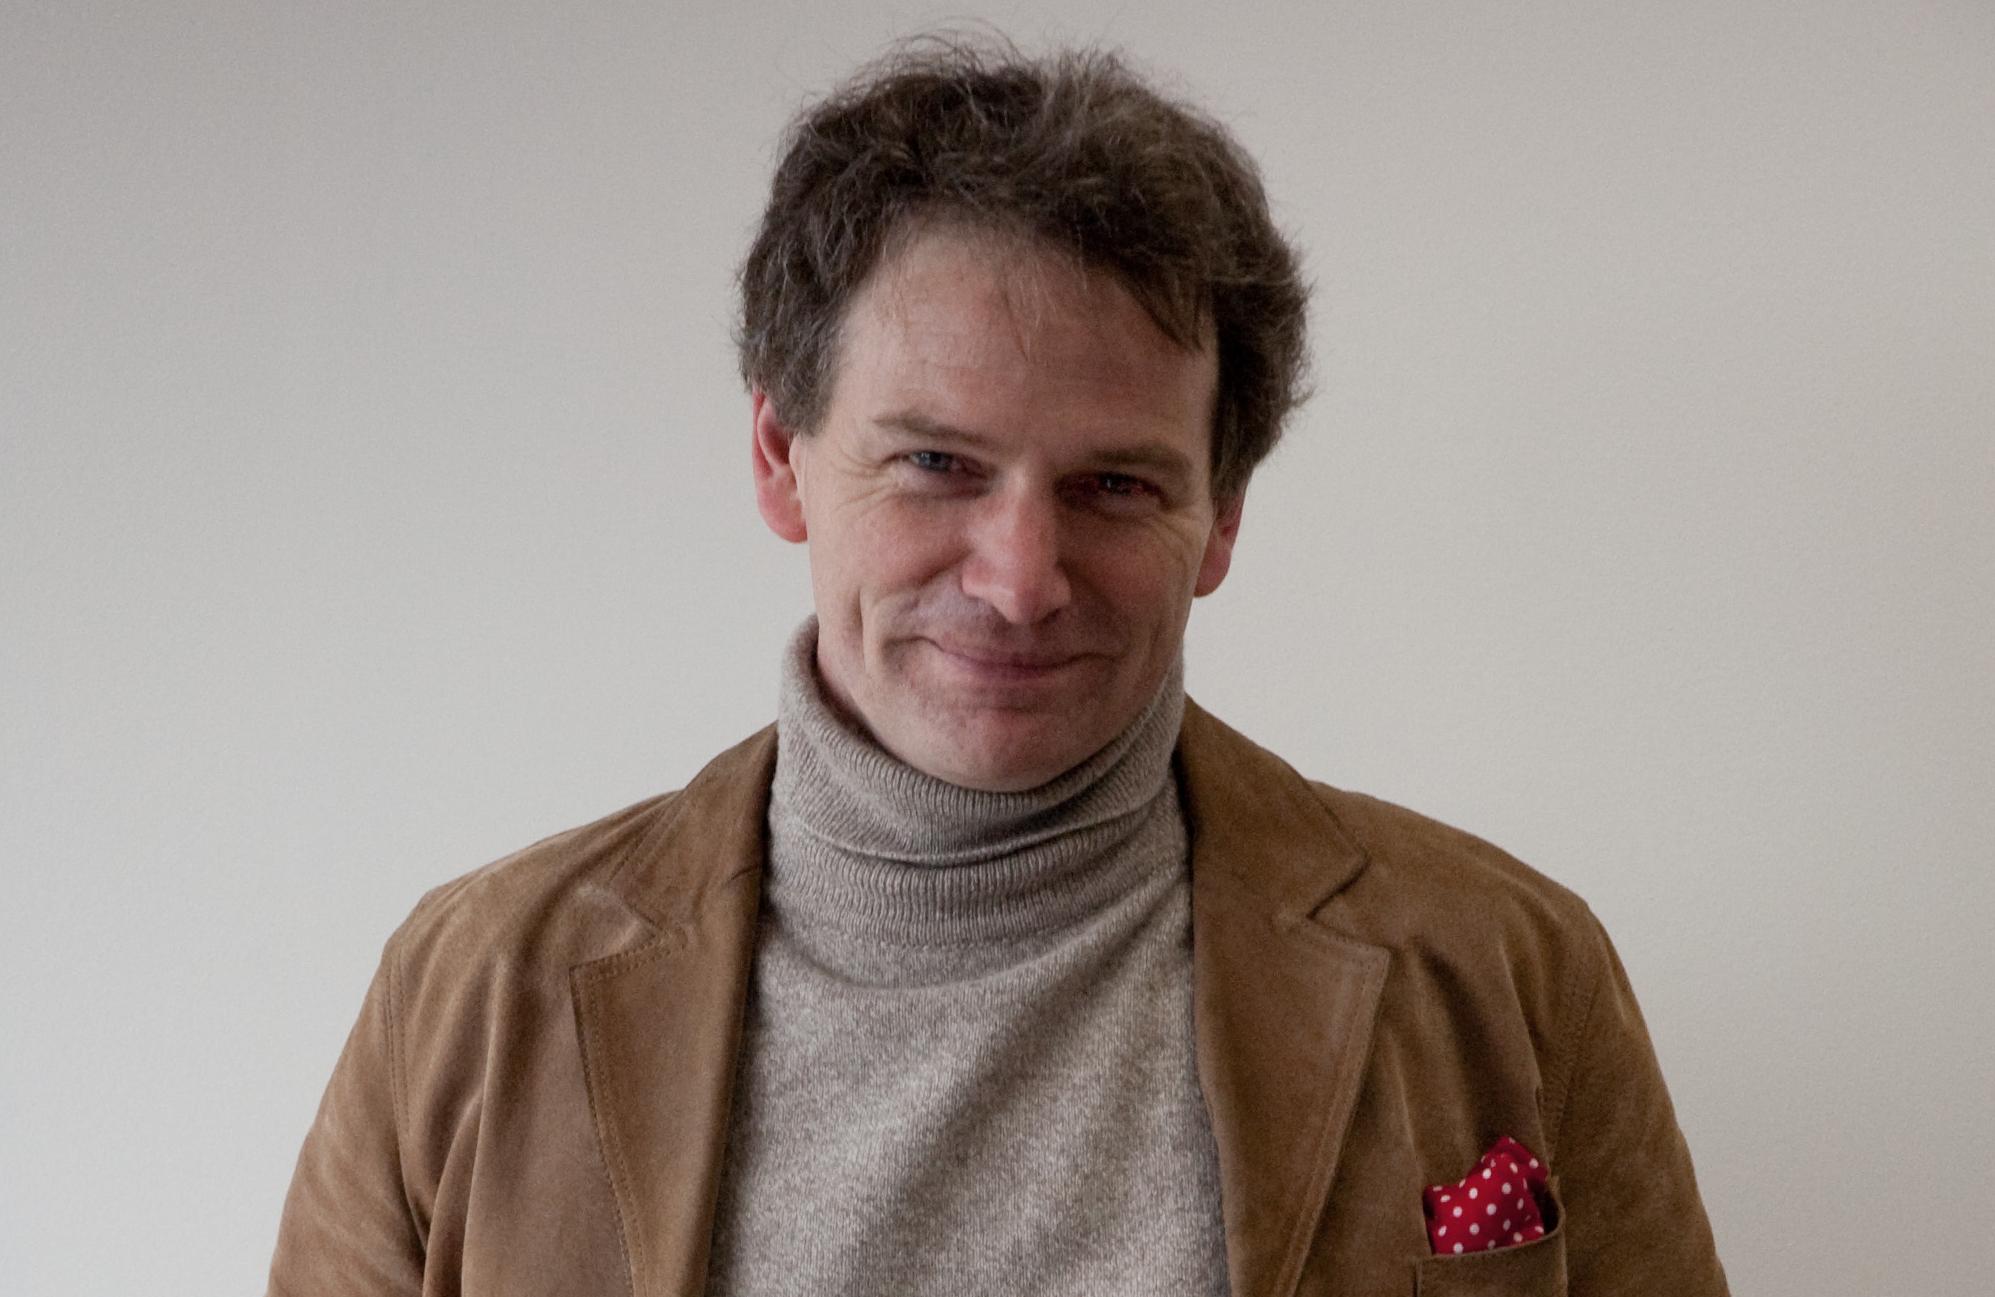 Smiling man in turtleneck jumper against a white background